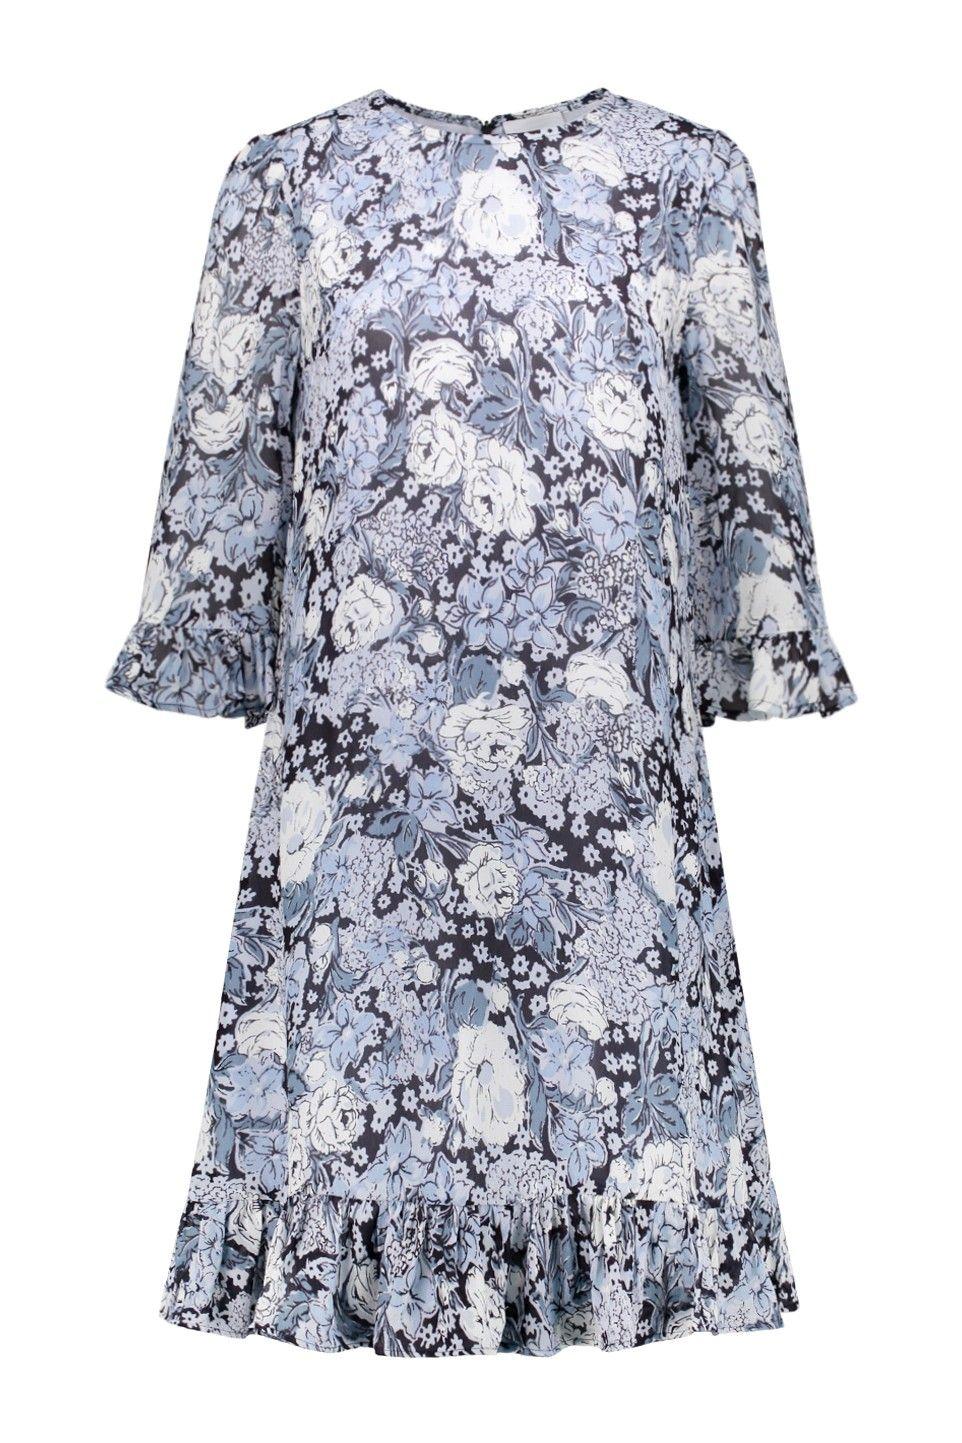 d8fc09c3b2 Ganni Dress Elm Georgette in Heather - F3178 1820 694 - VROUW Bloom Fashion